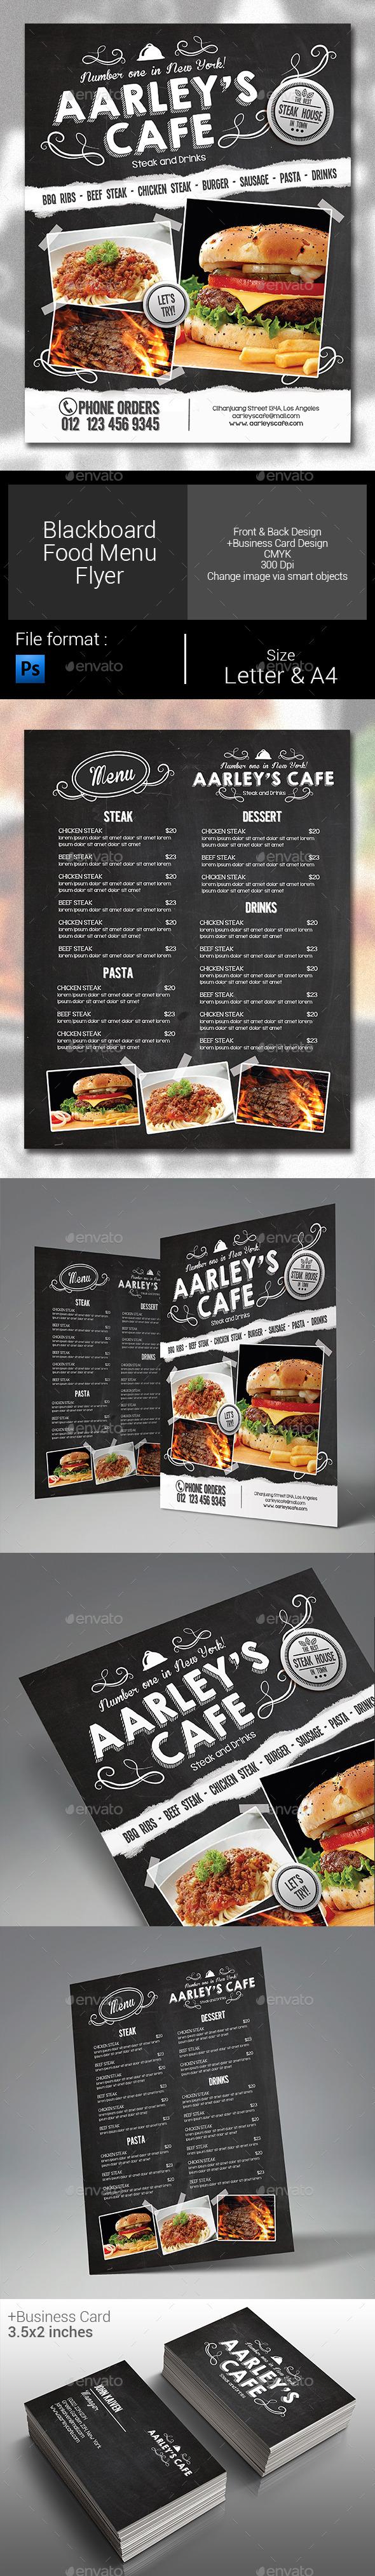 Blackboard Menu Flyer  - Food Menus Print Templates